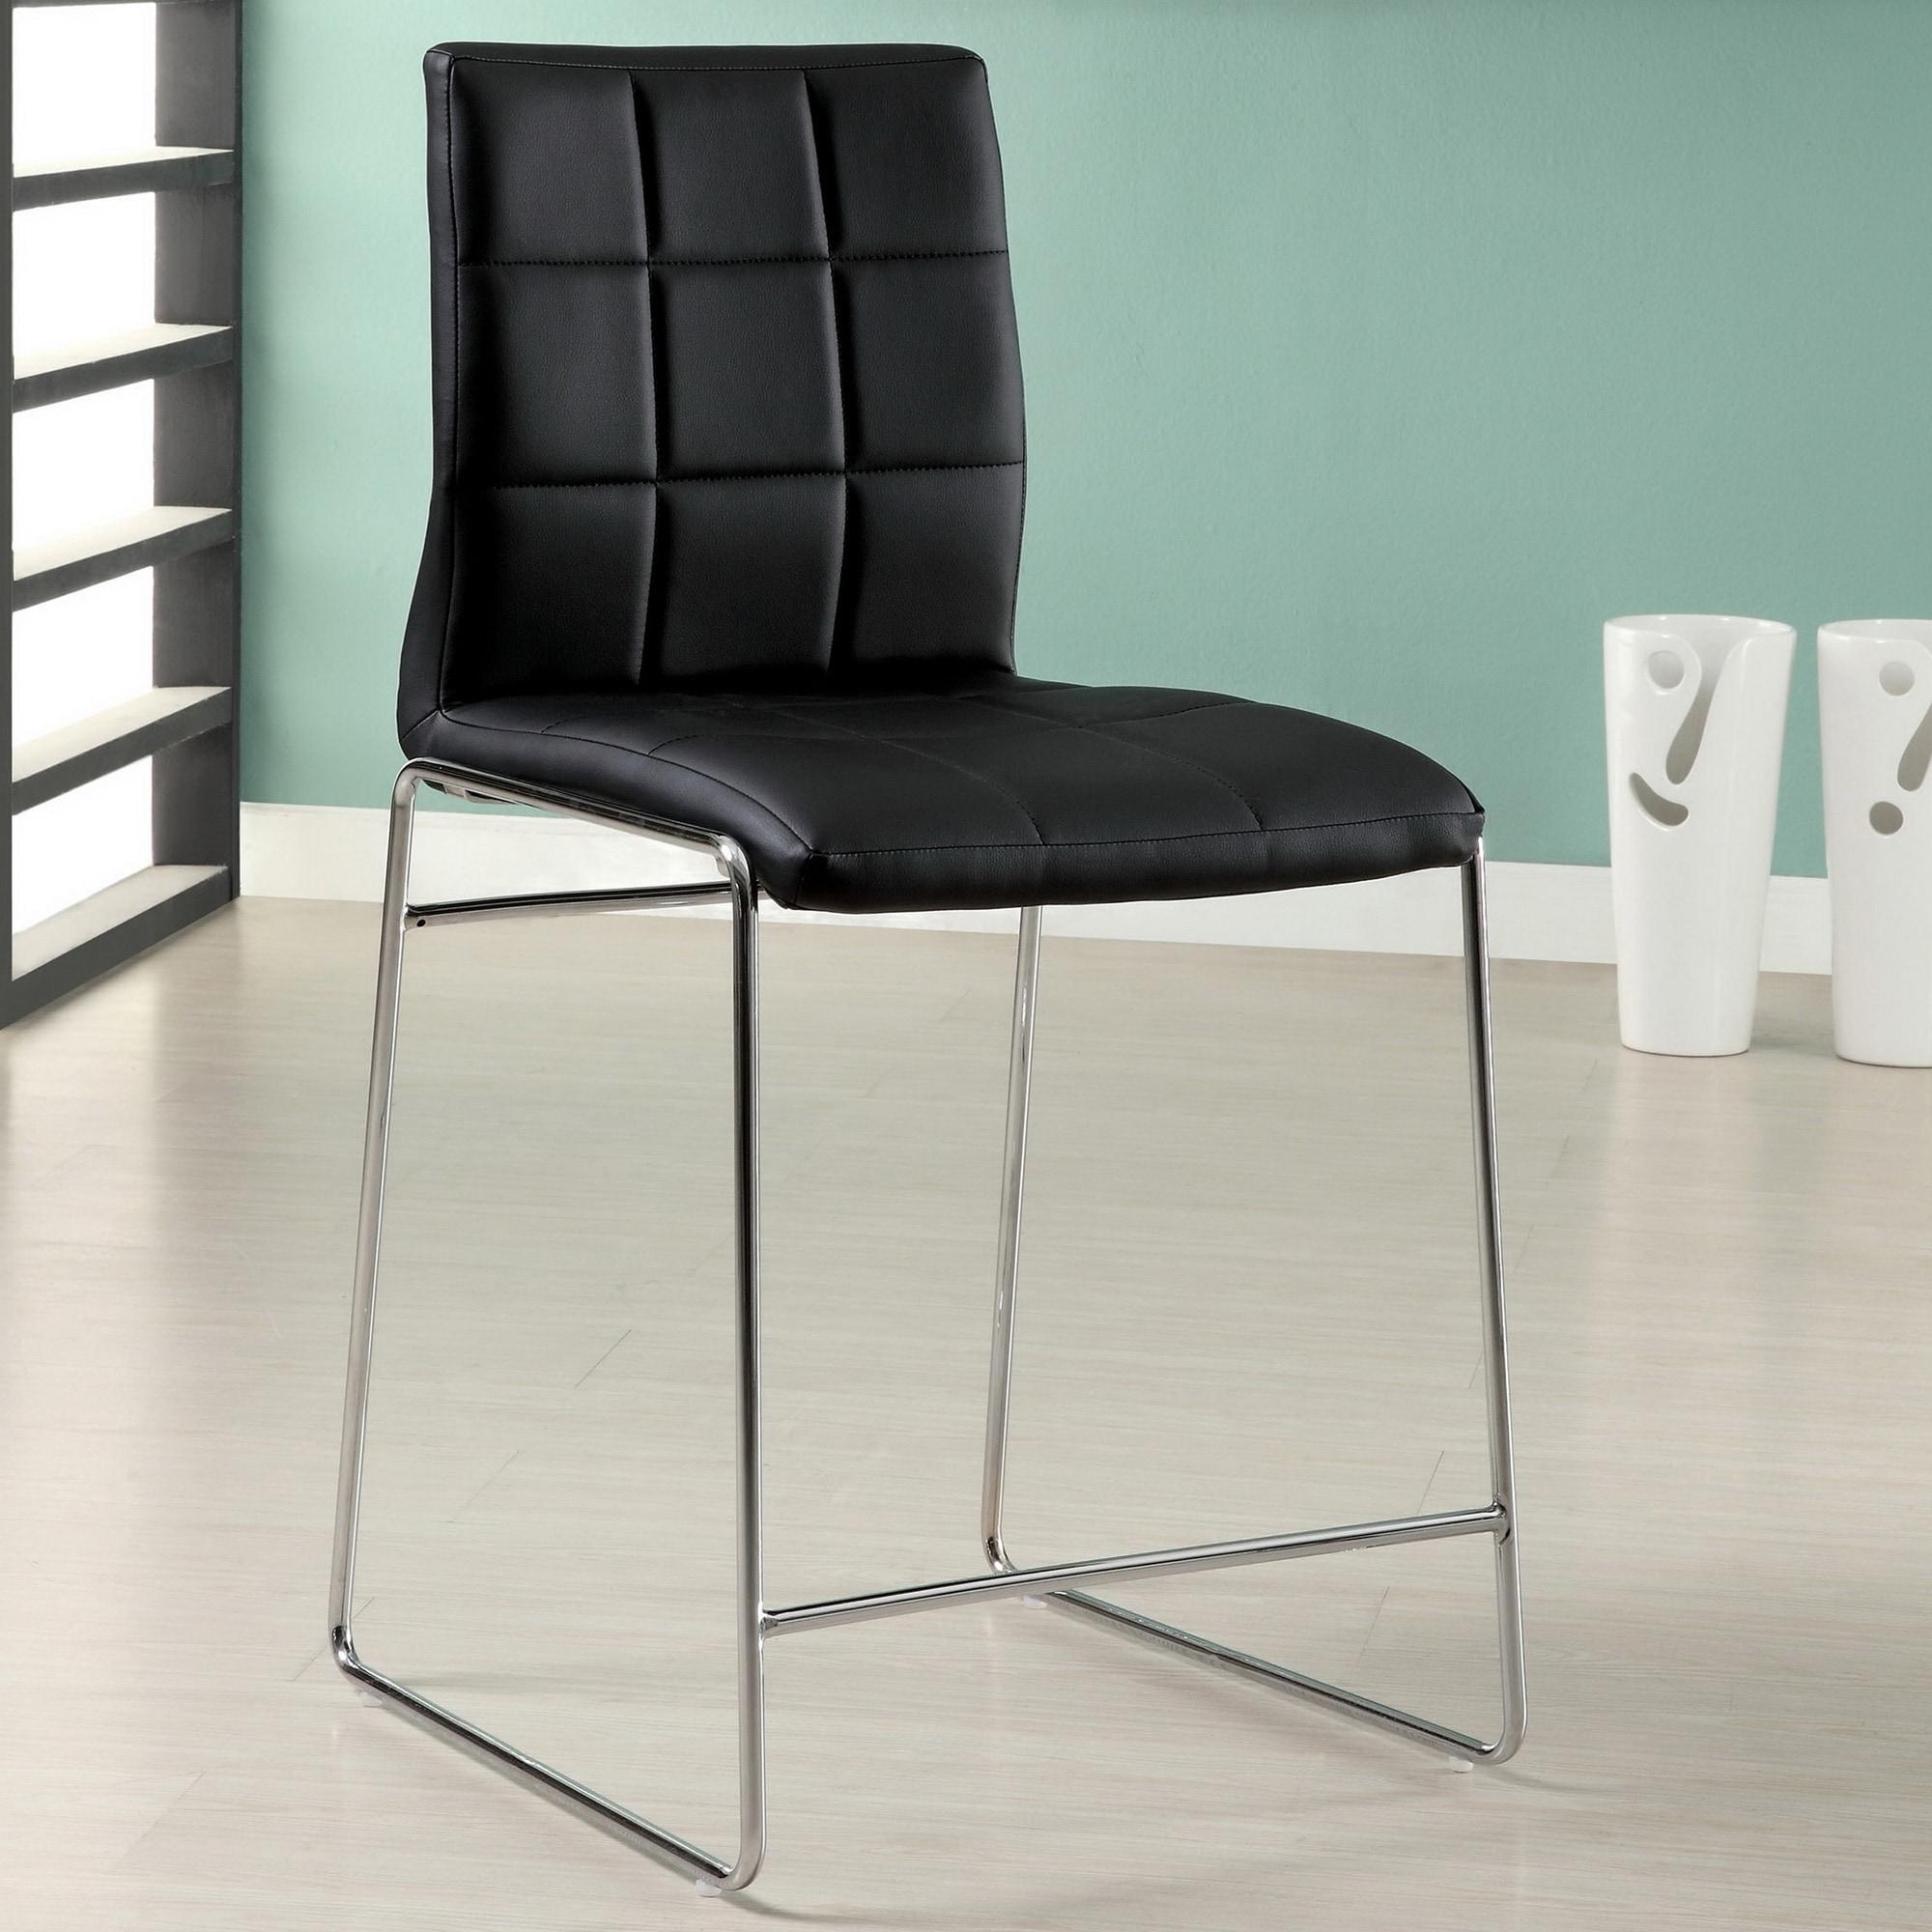 Attirant Furniture Of America Ashford Leatherette 24 50 Inch